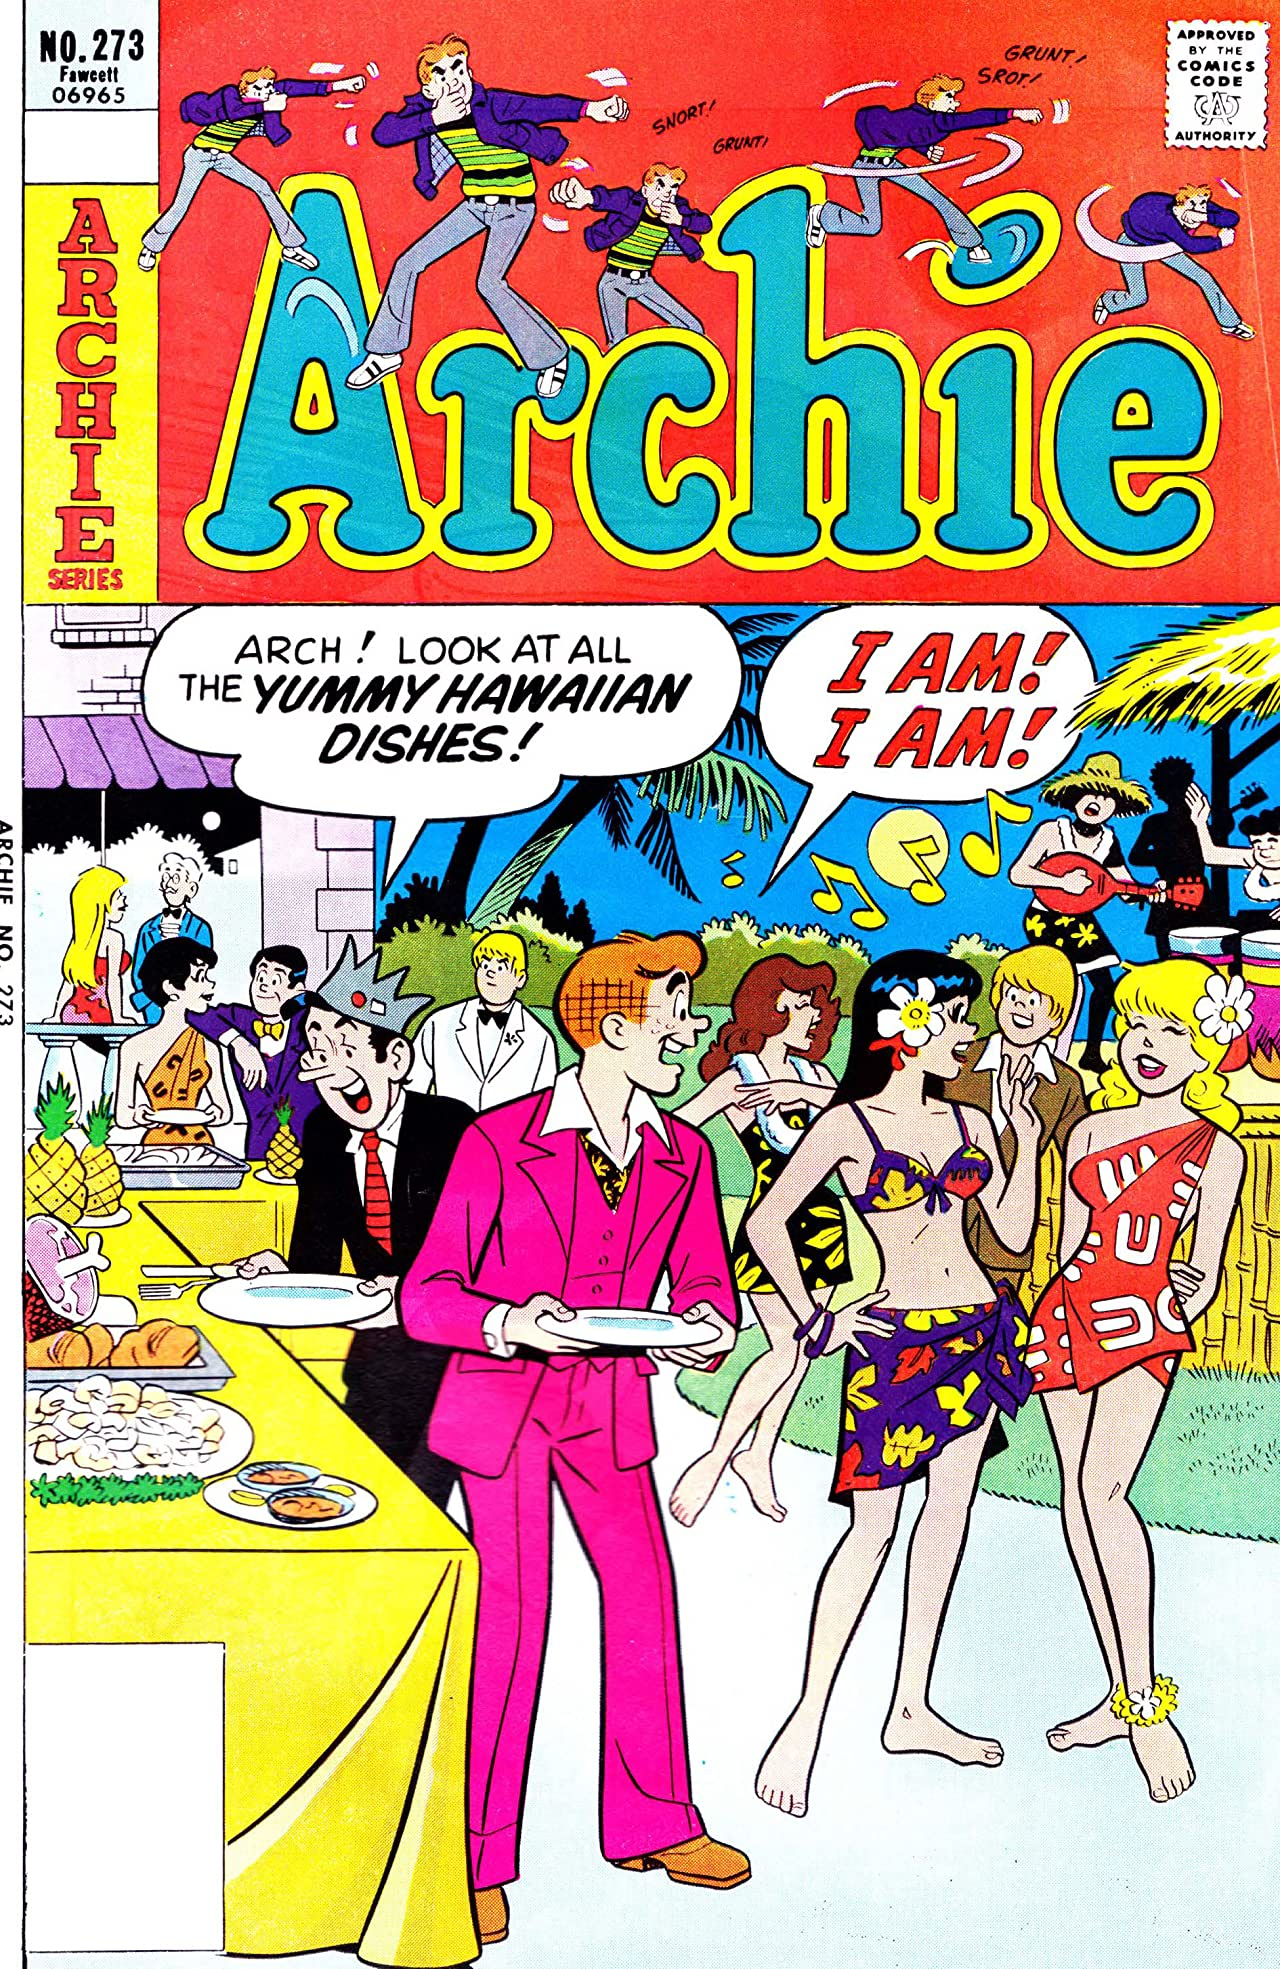 Archie #273